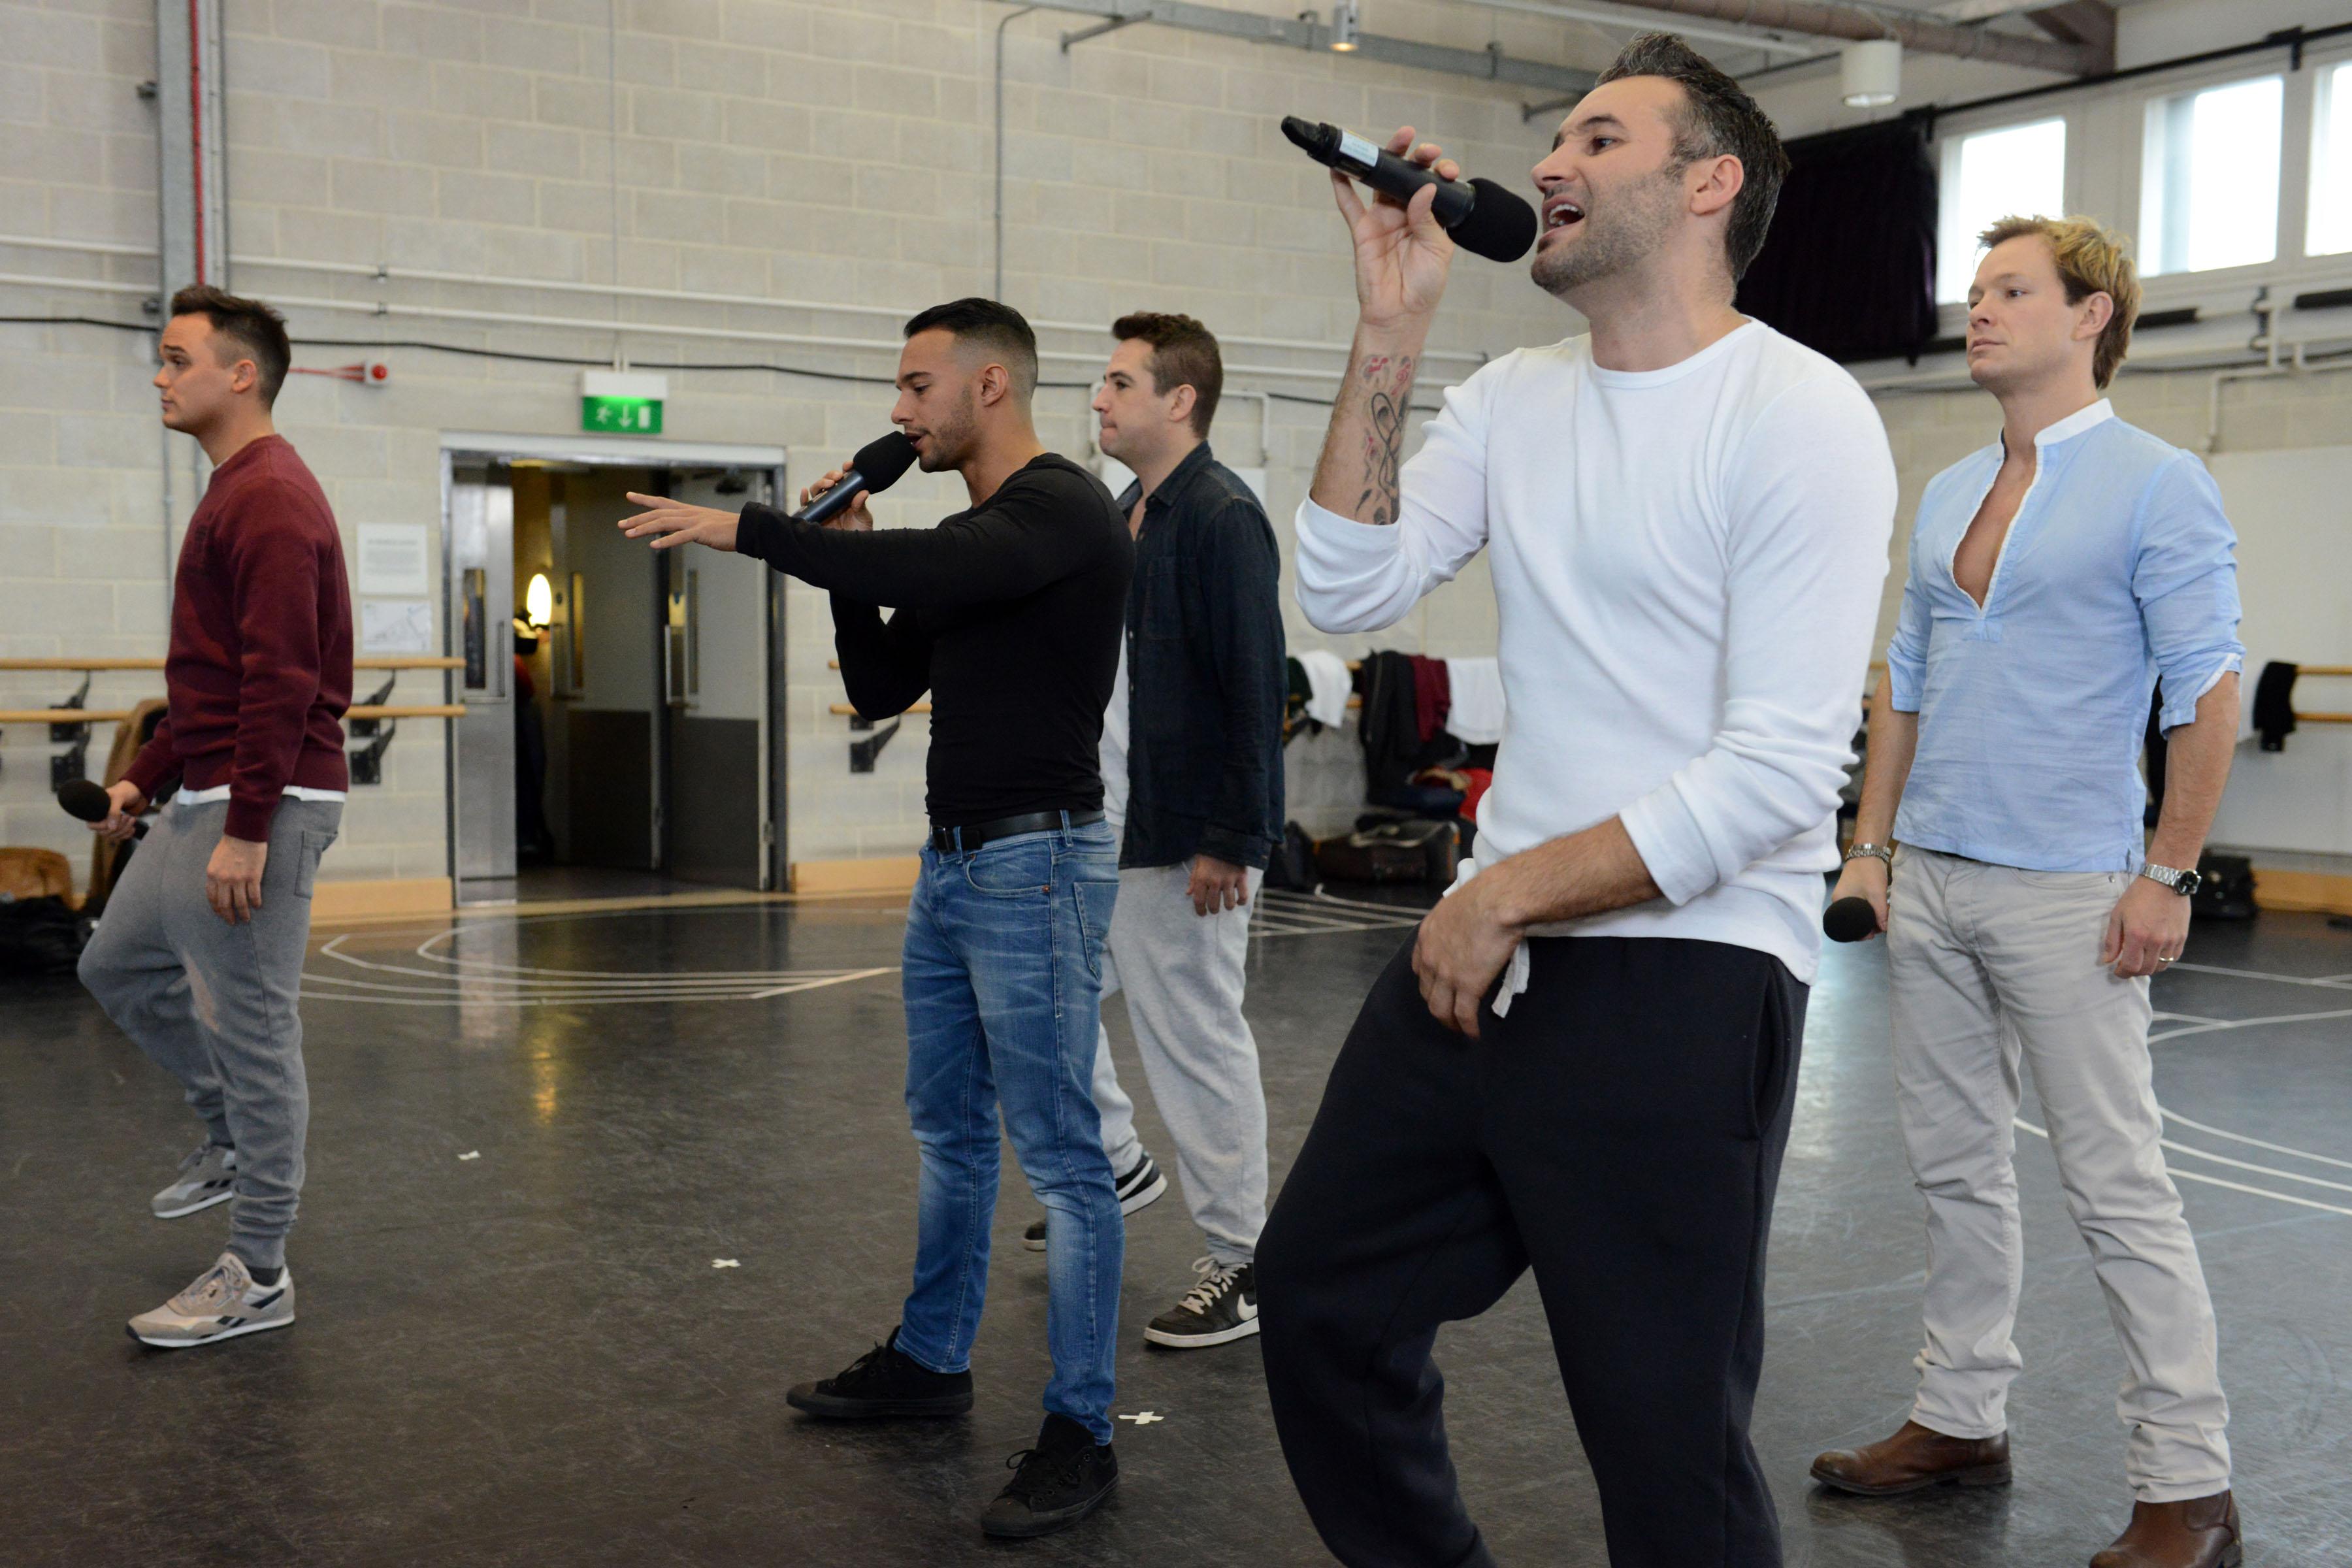 The Big Reunion 2014: Dane Bowers possibly devastated over comeback gig